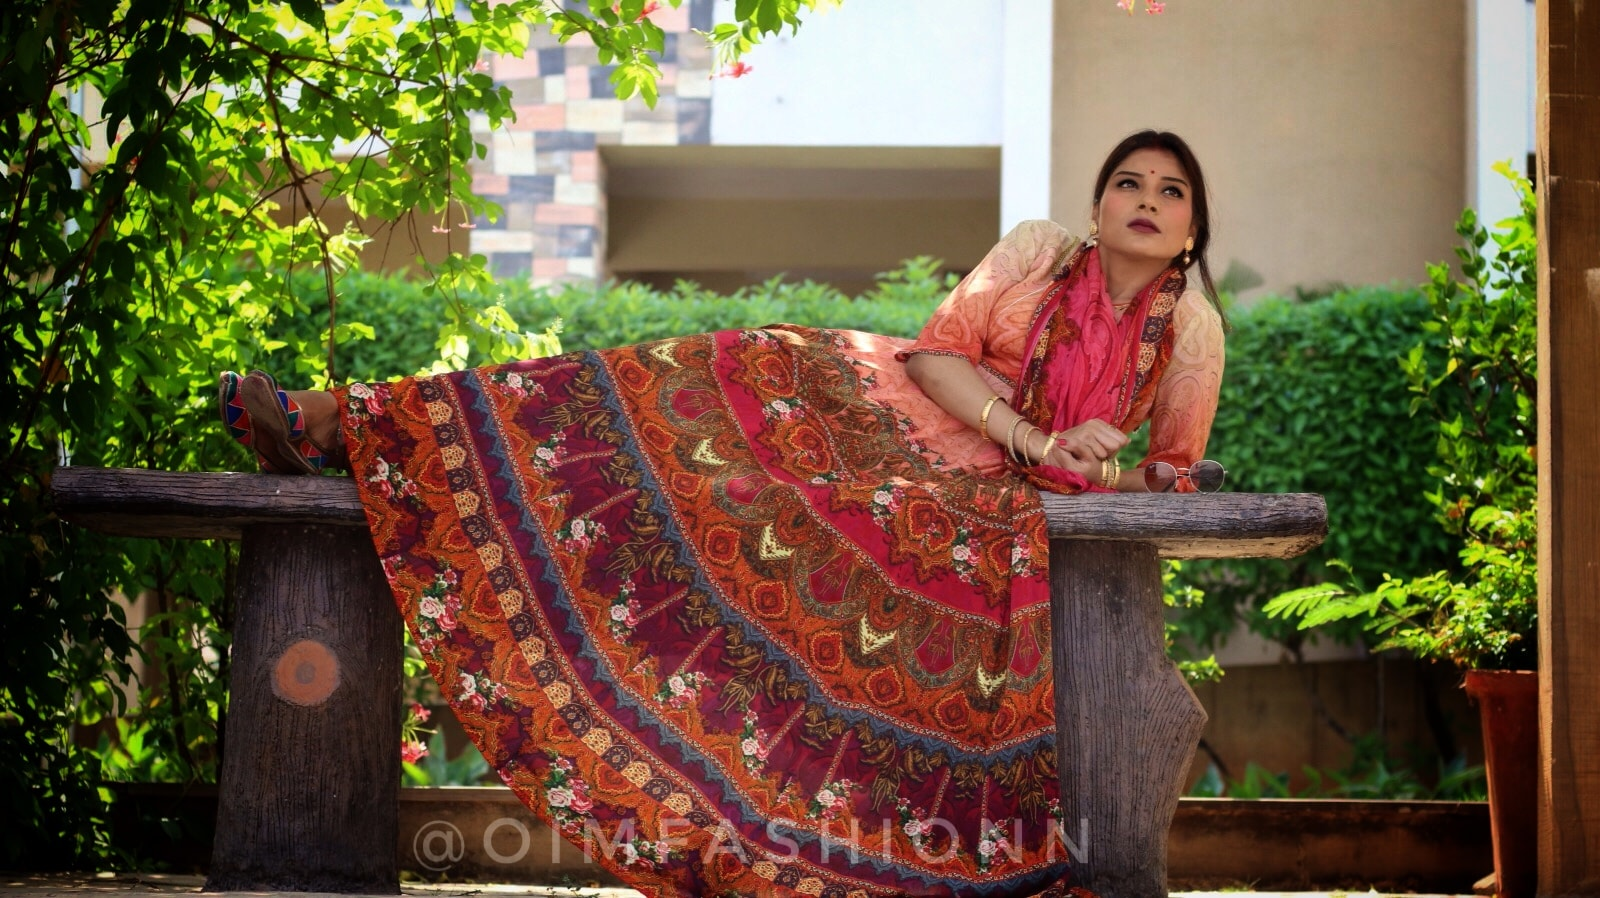 Sabyasachi Mukherjee, Designer suits,Top Fashion Bloggers India , Anarkali Suits, Indian Jewellery, Ritu Pandit, Ethnic fashion bloggers, Wishalley.com